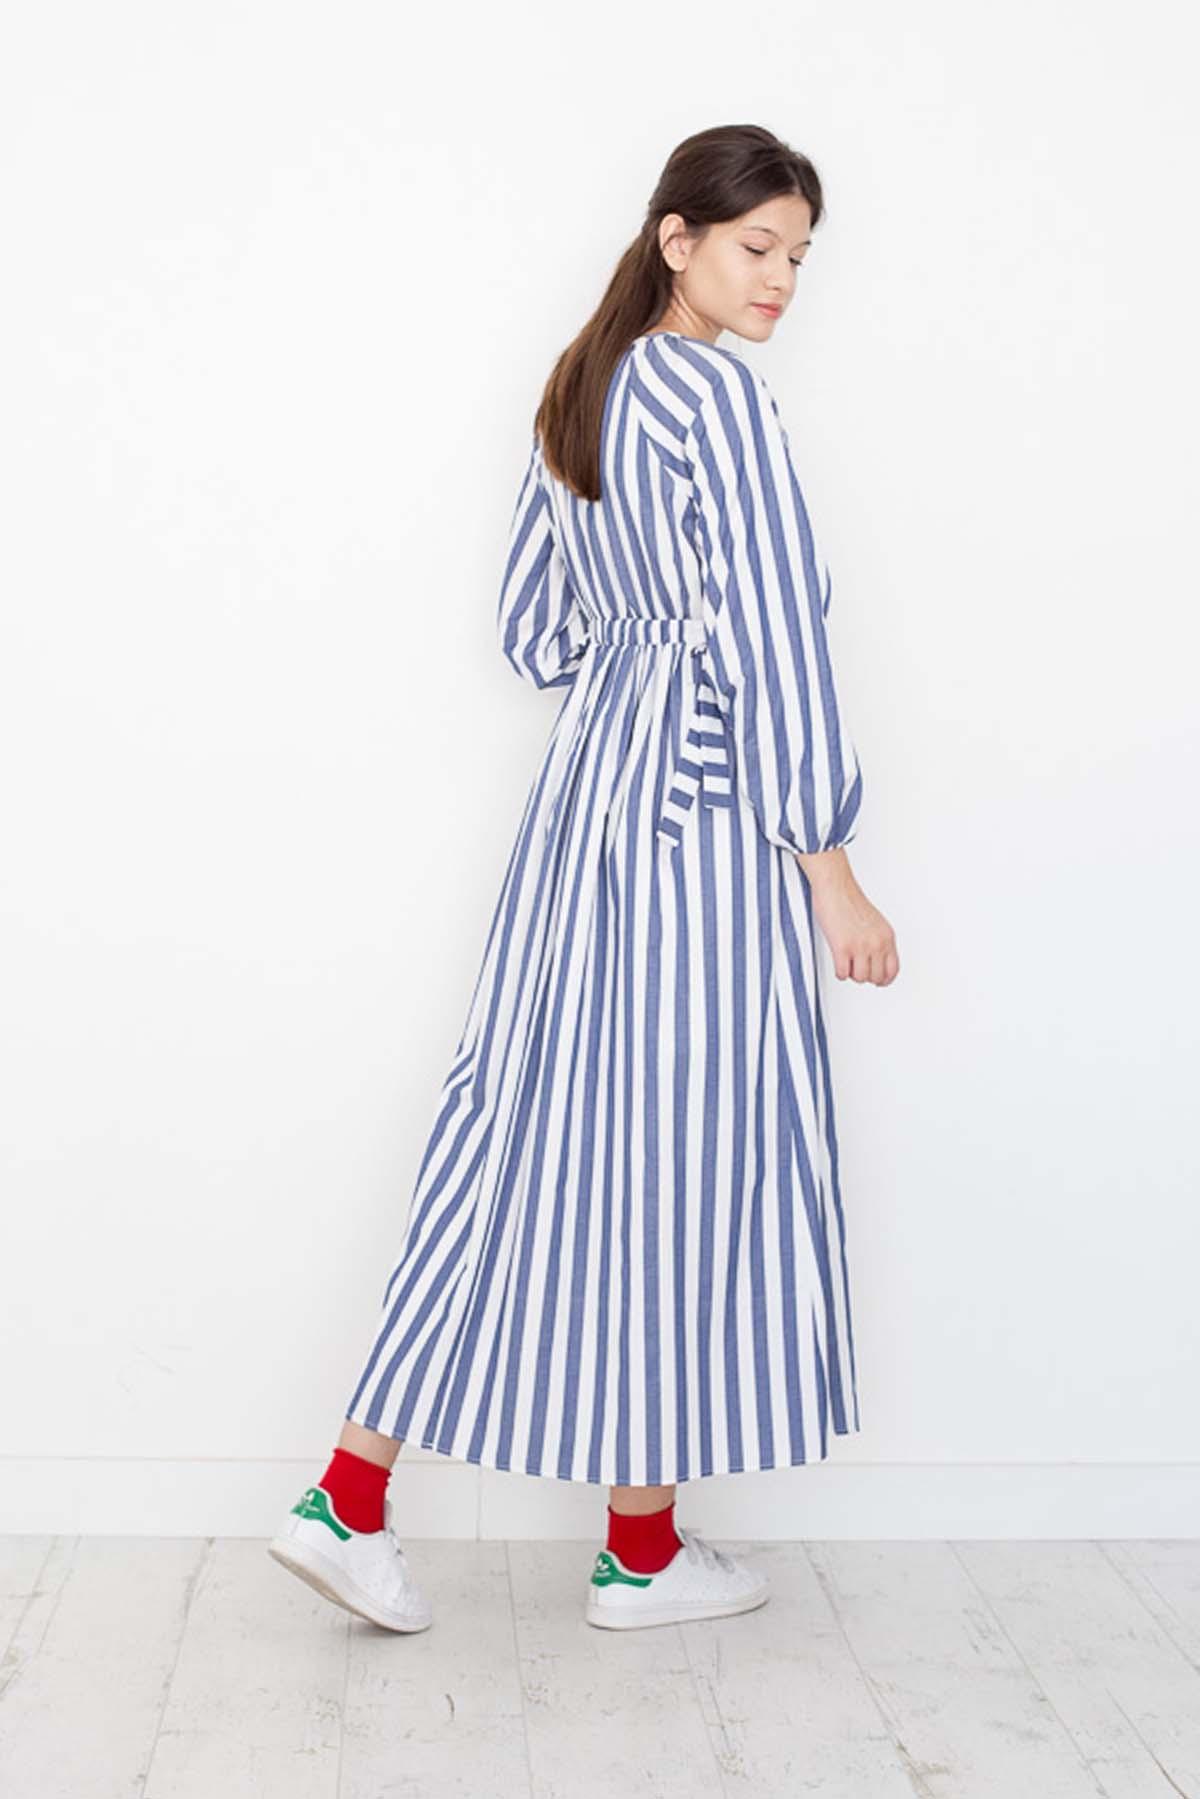 Mevra - Çizgili Kuşaklı Elbise Laci